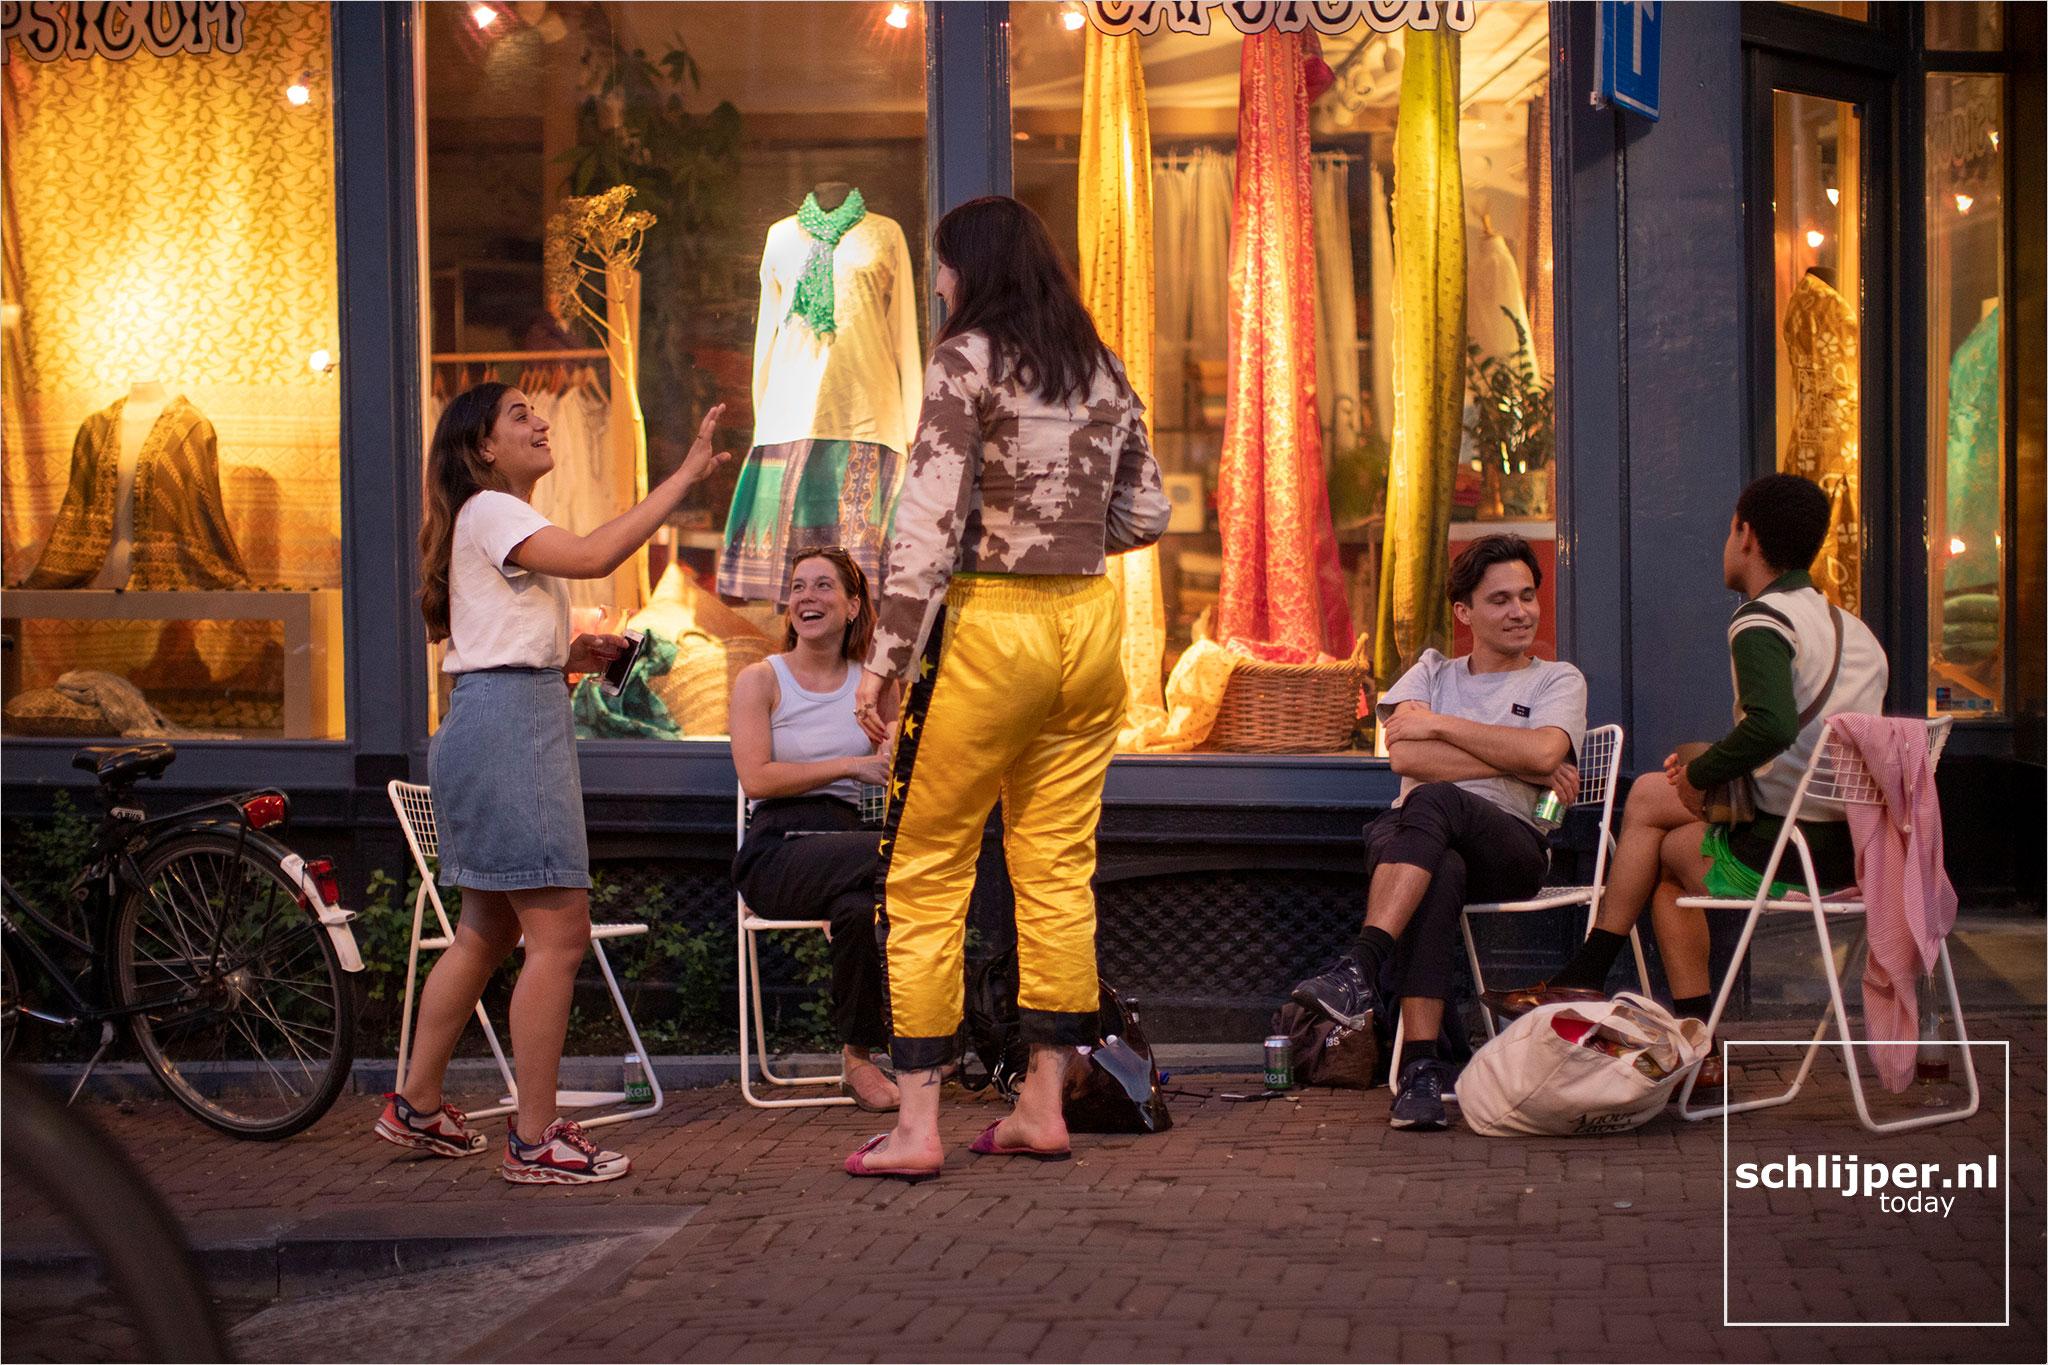 The Netherlands, Amsterdam, 1 juni 2021